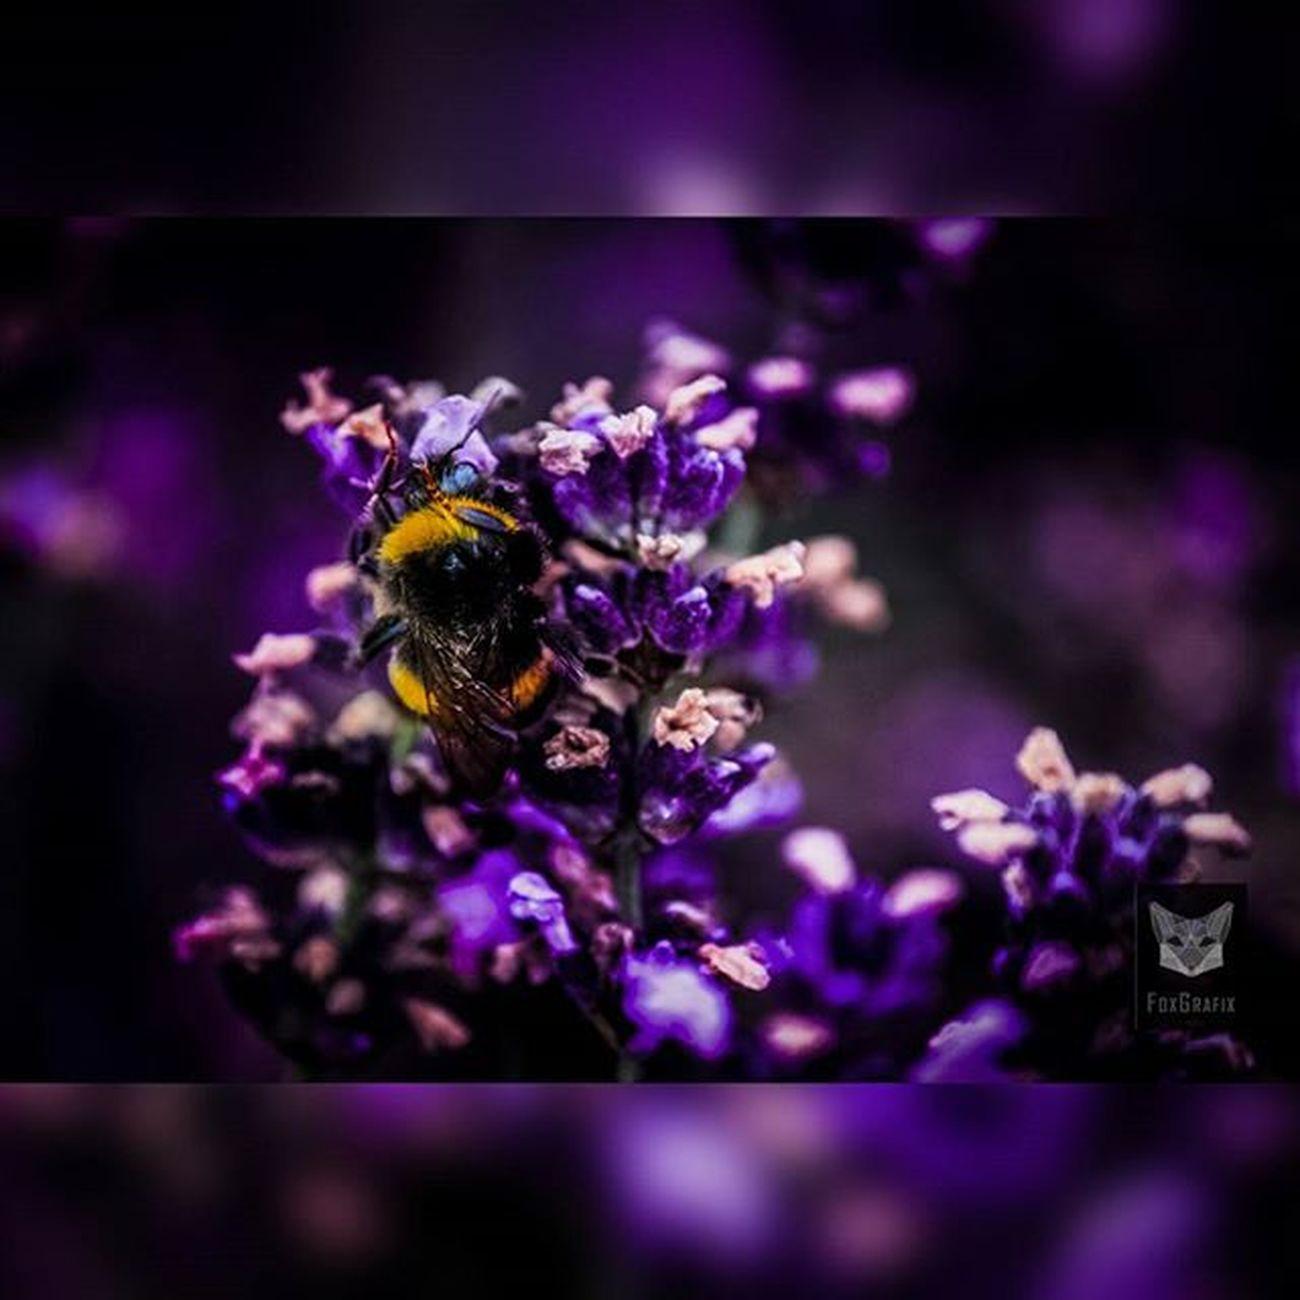 Bumblebee makes Sport :D Fotografie Salzgitter Naturfoto Naturephotography Macro Bumblebee Hummel Lavendel Lavender Lavenderfield Lavendelfeld Photographyislife Photgraphy Macrofoto Makrophotography